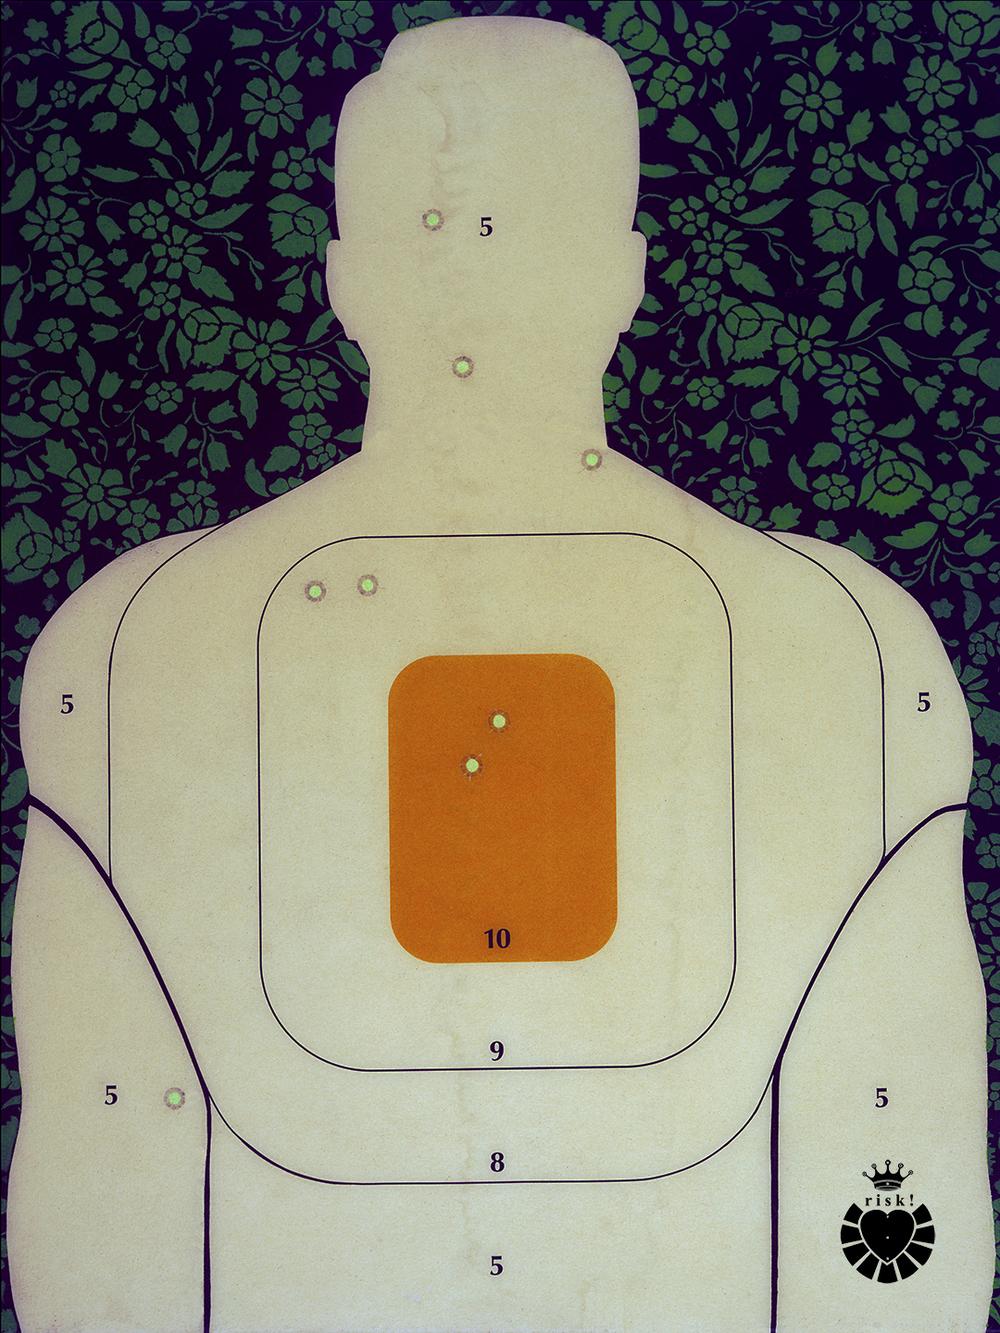 Hank's Training Target / 24 x 18 / Original Sold